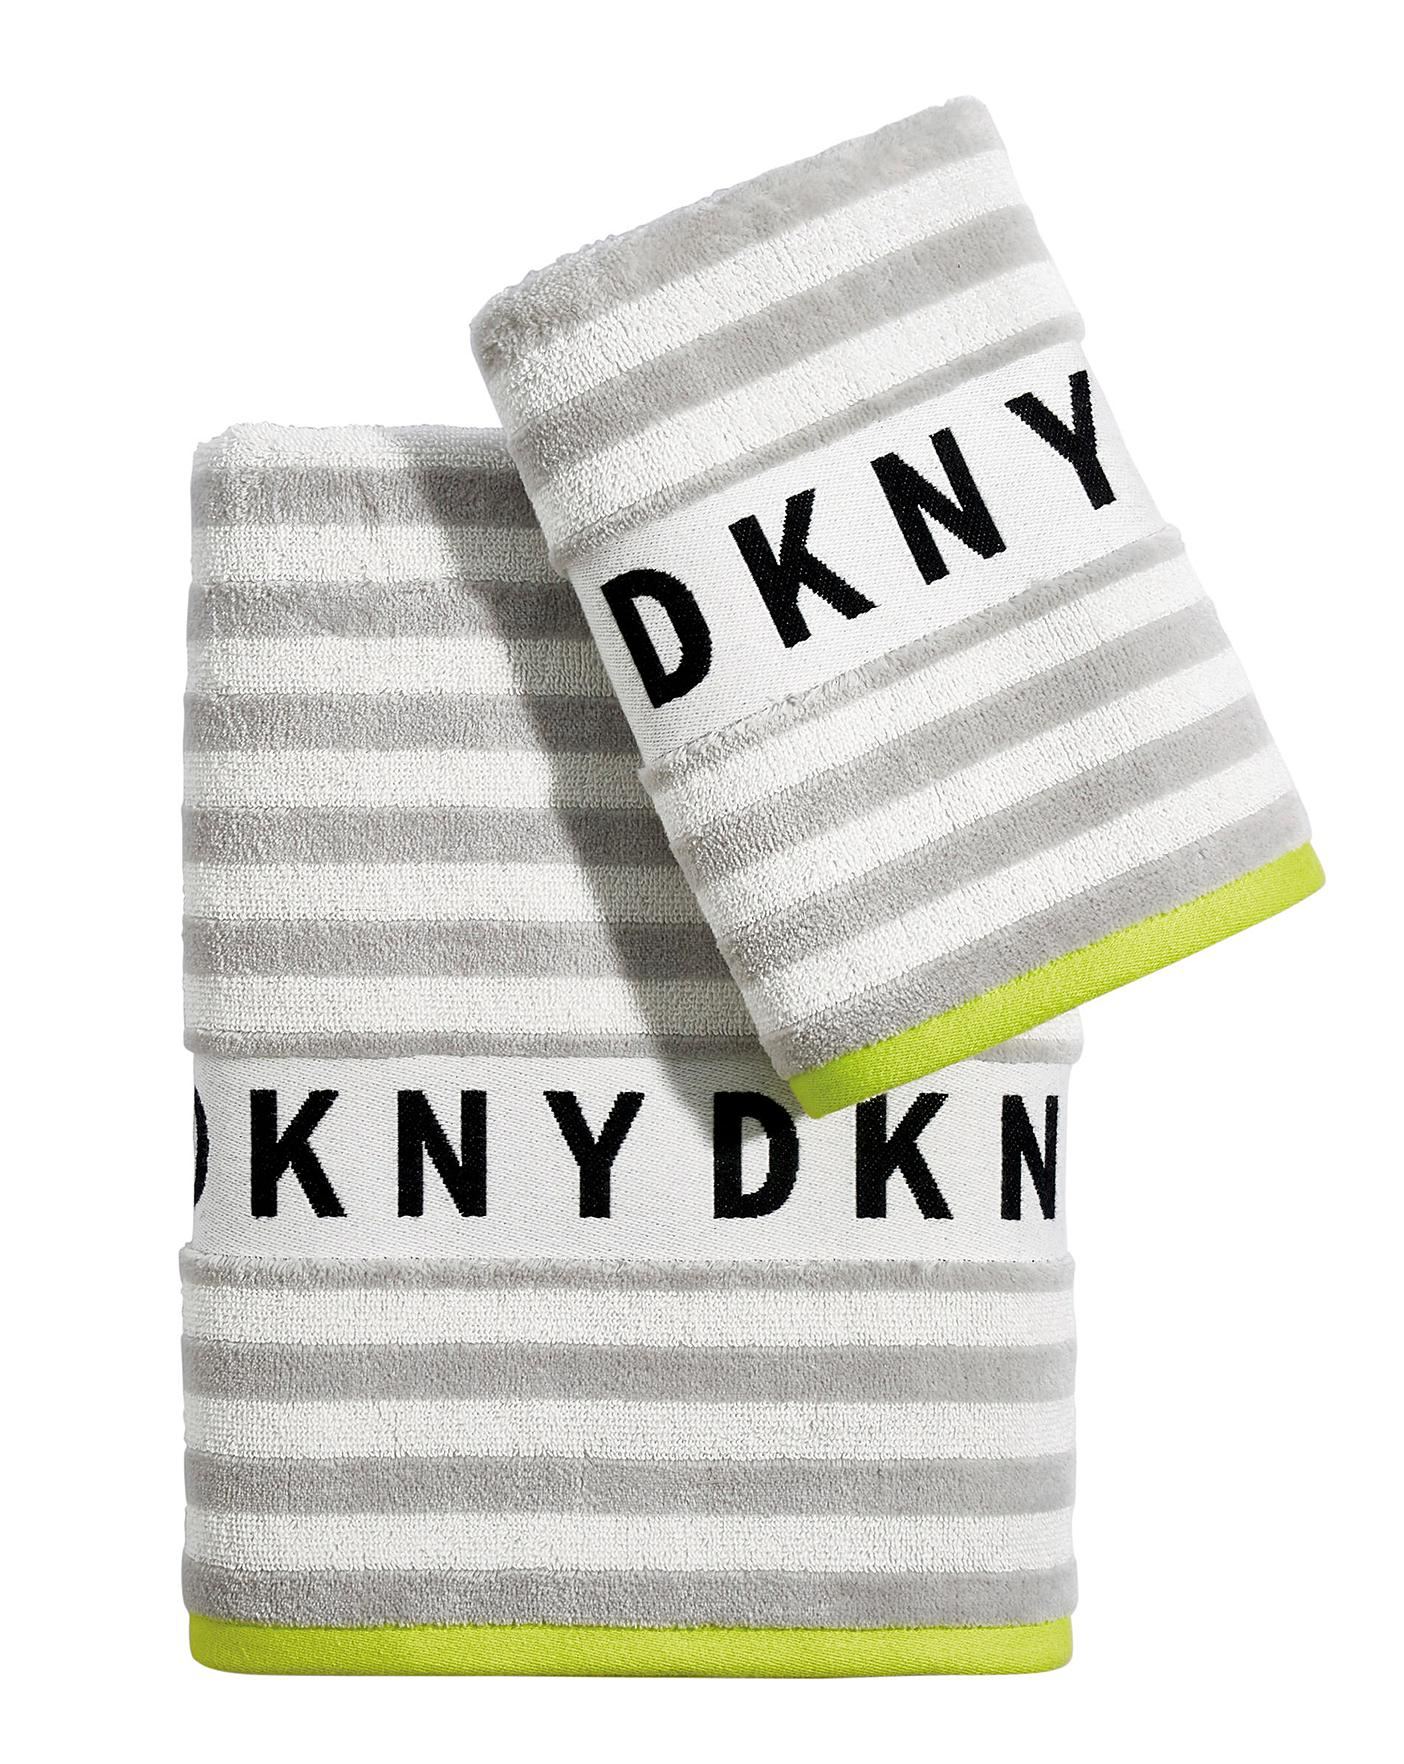 Dkny Ticker Tape Towel Fashion World